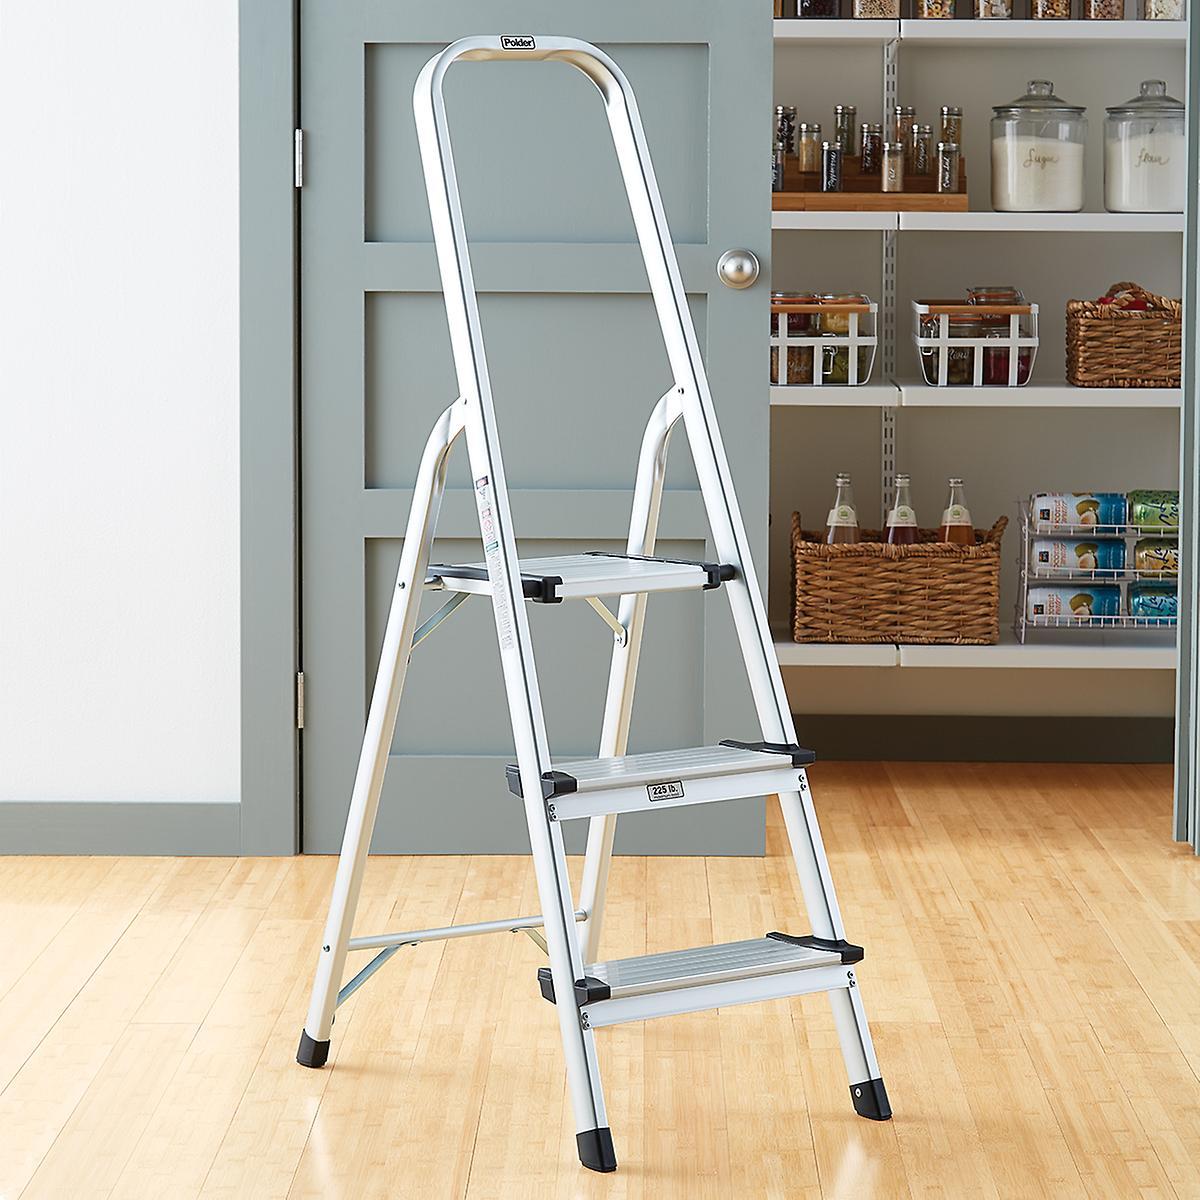 Amazing Polder 3 5 Step Aluminum Folding Ladders Squirreltailoven Fun Painted Chair Ideas Images Squirreltailovenorg